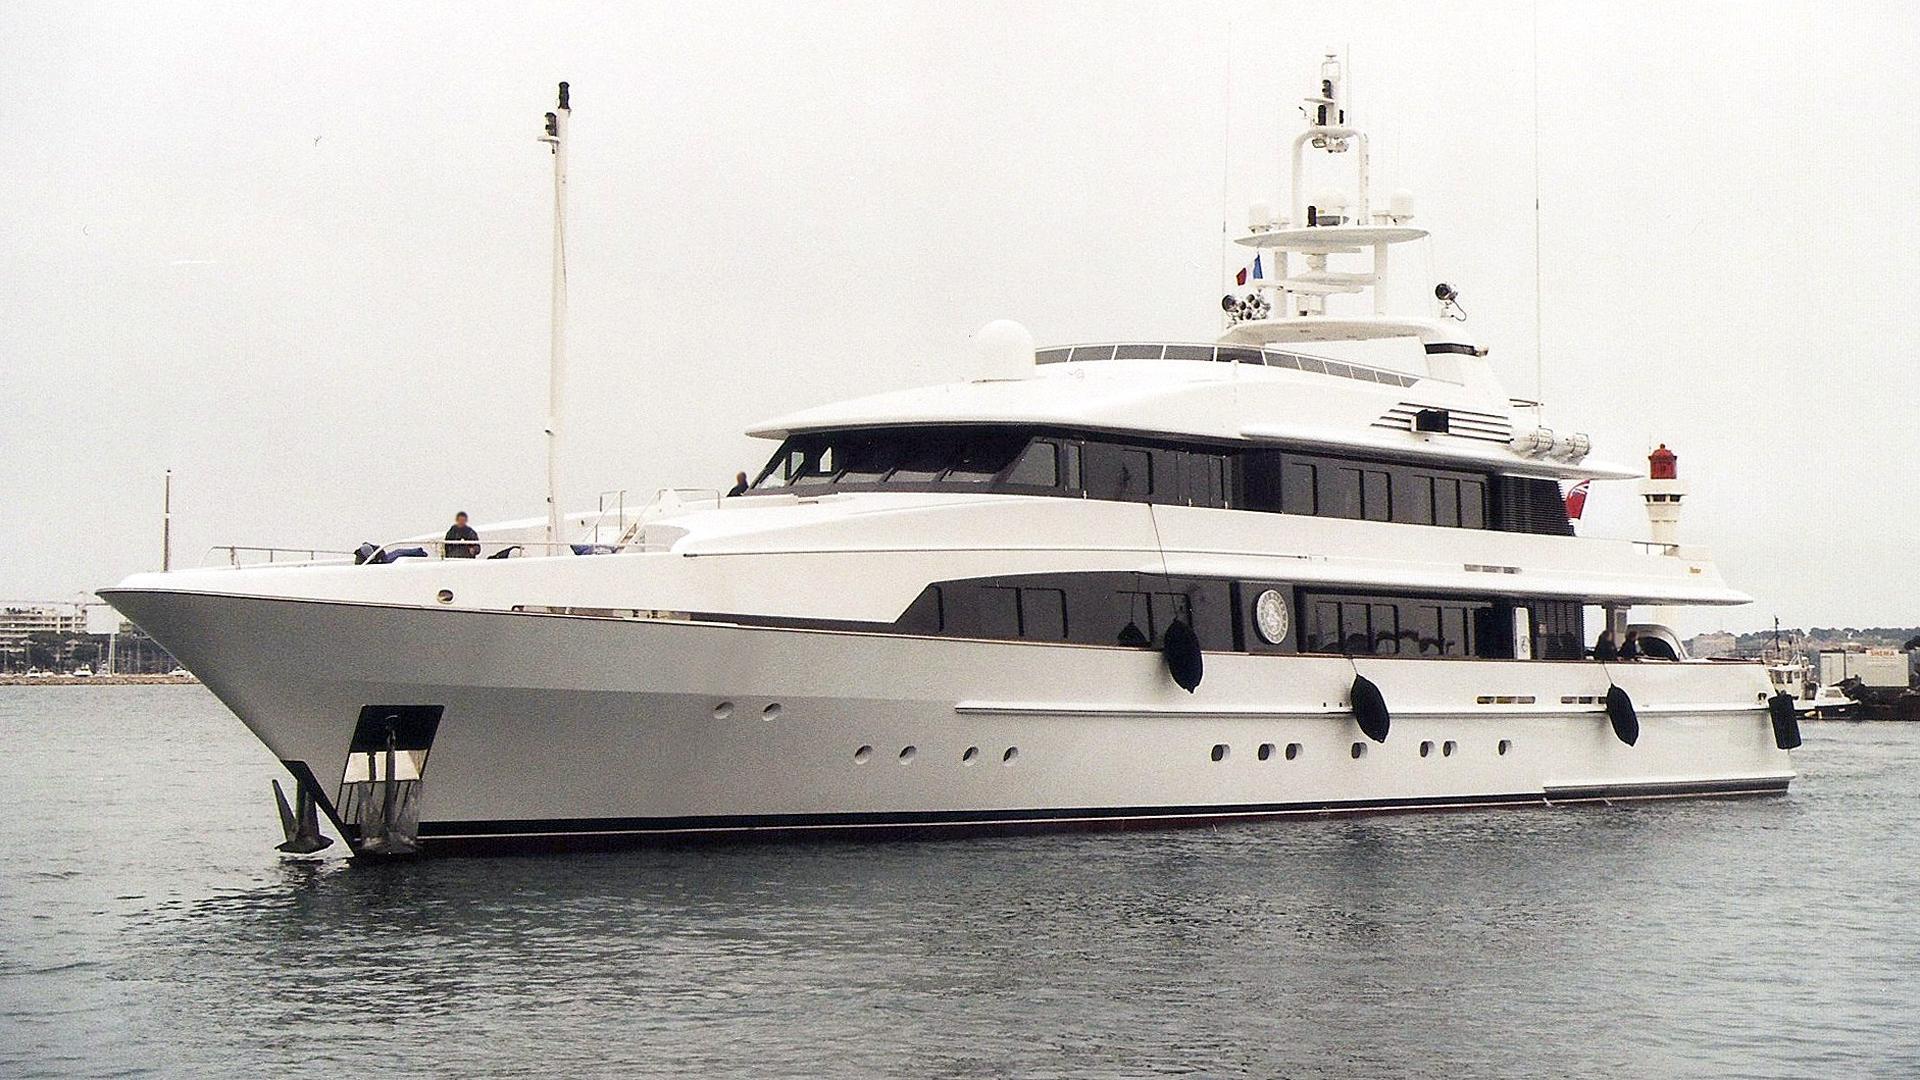 ostar-motor-yacht-feadship-1999-52m-profile